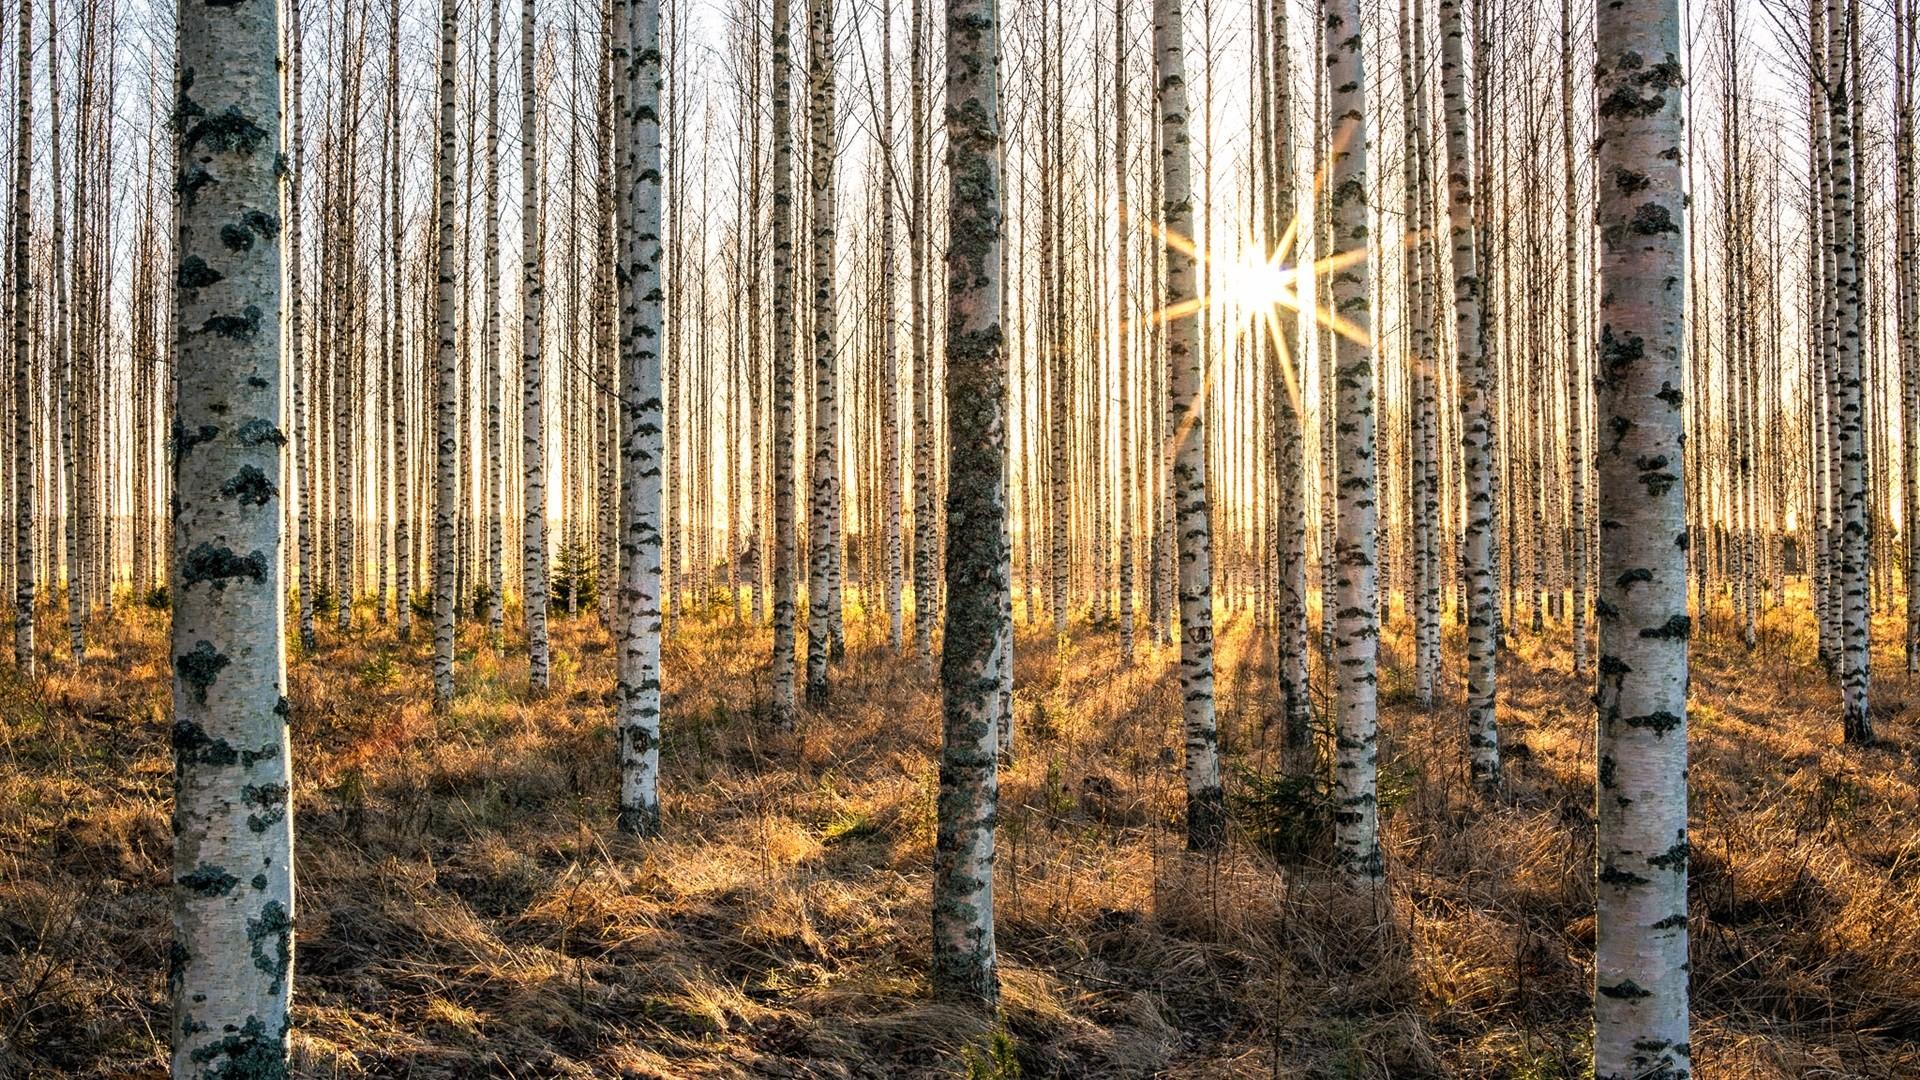 Birch Tree Wallpaper Picture hd